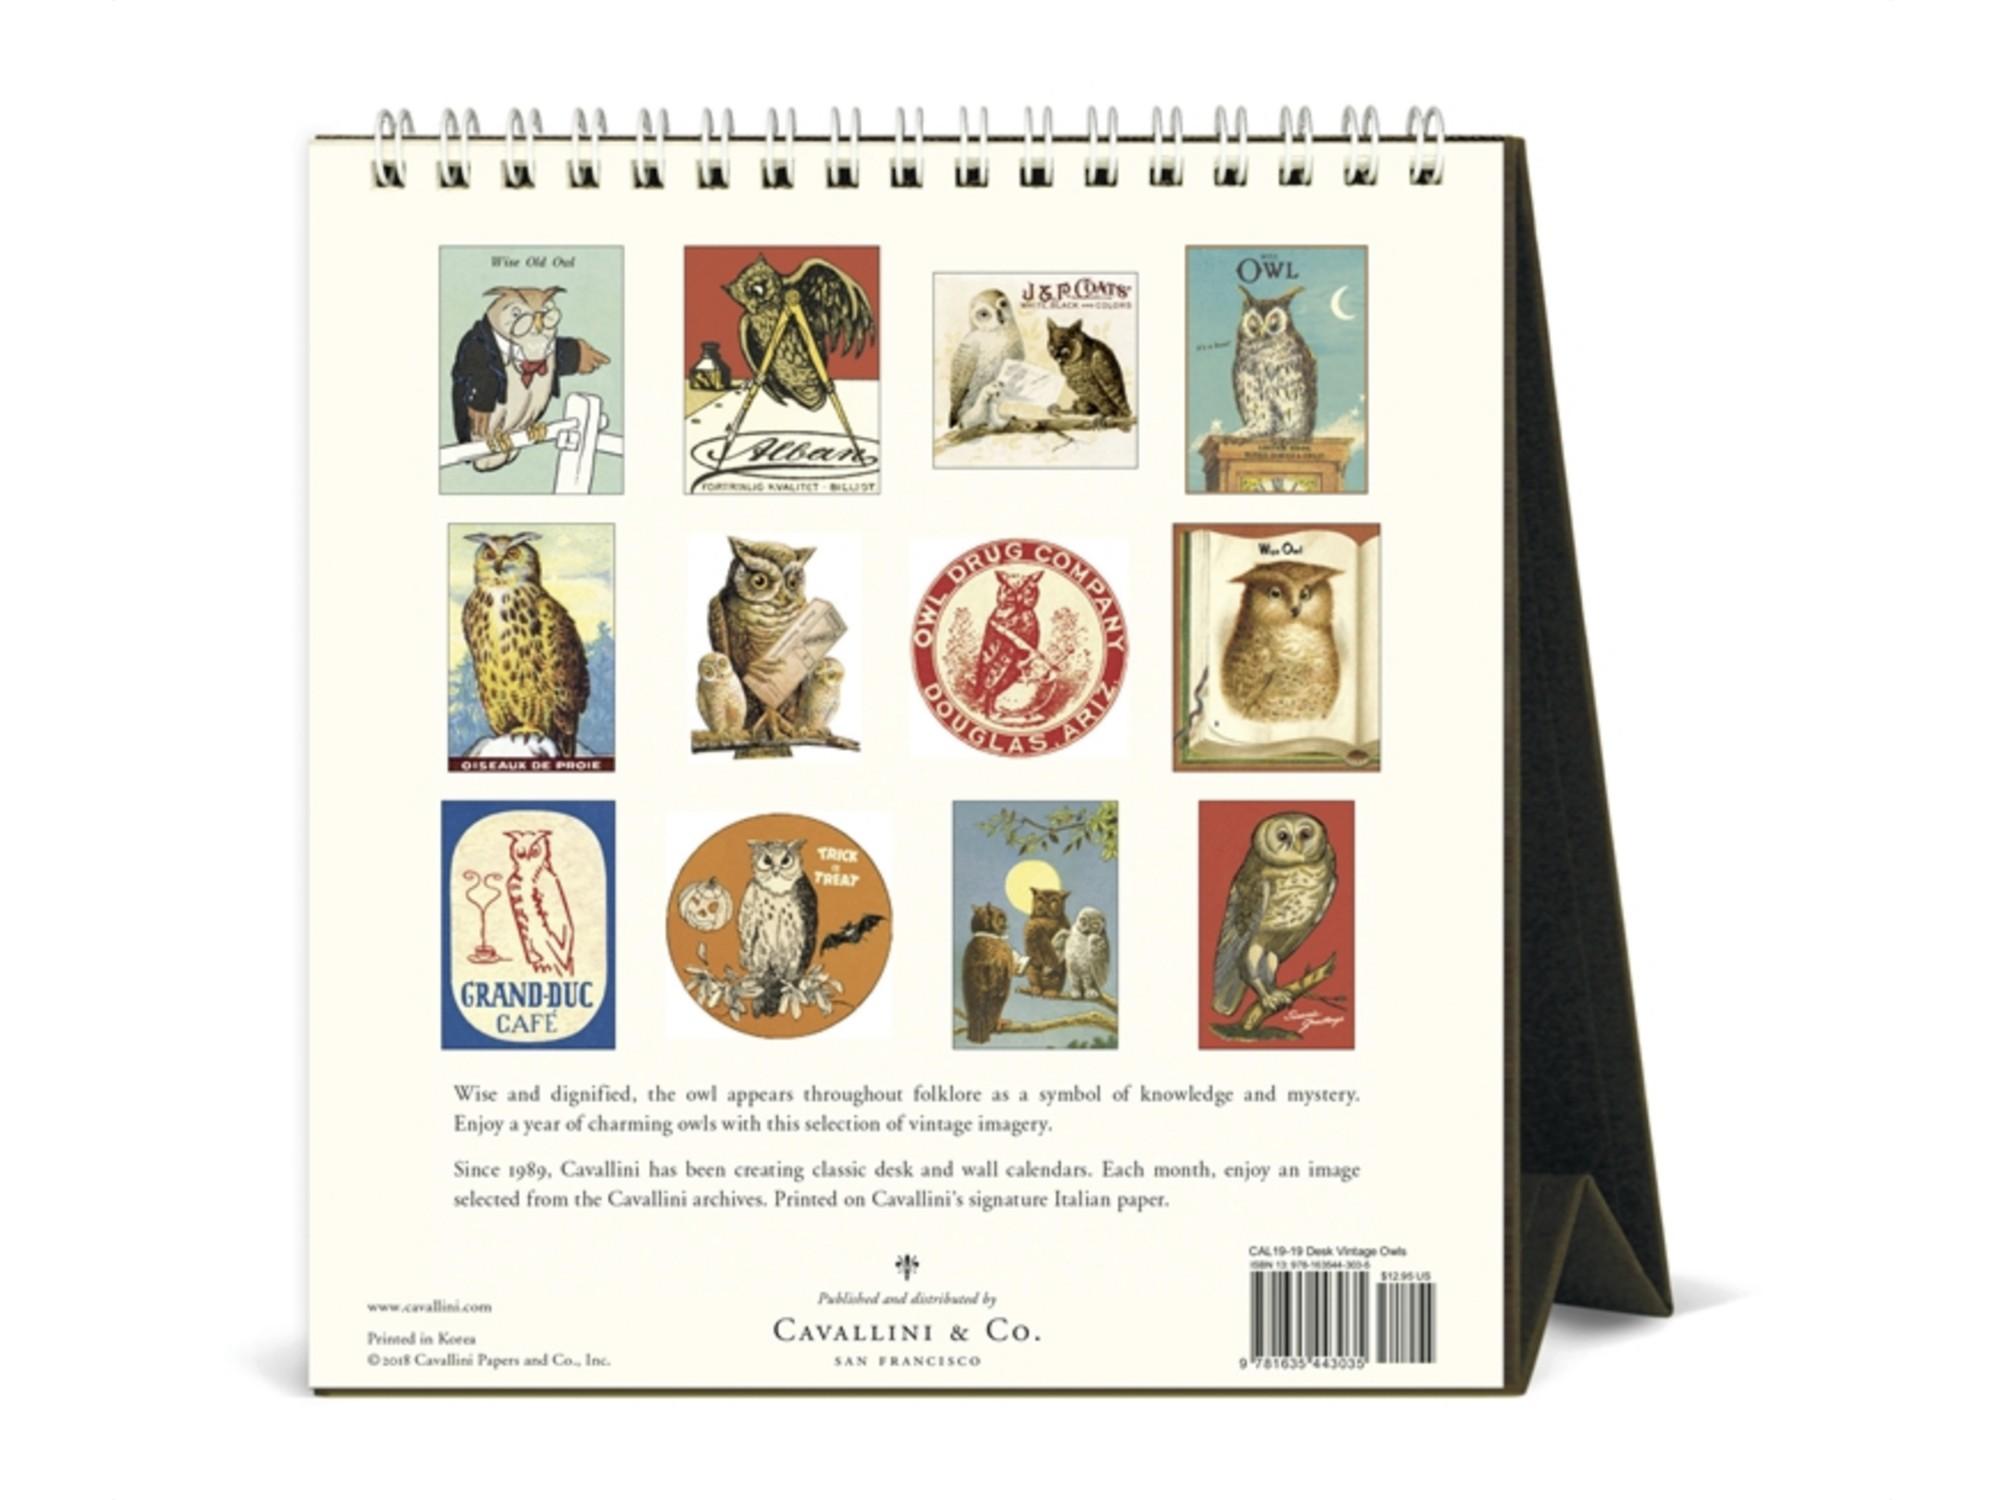 Cavallini 2019 Desk Calendar Vintage Owls – Jenni Bick Bookbinding